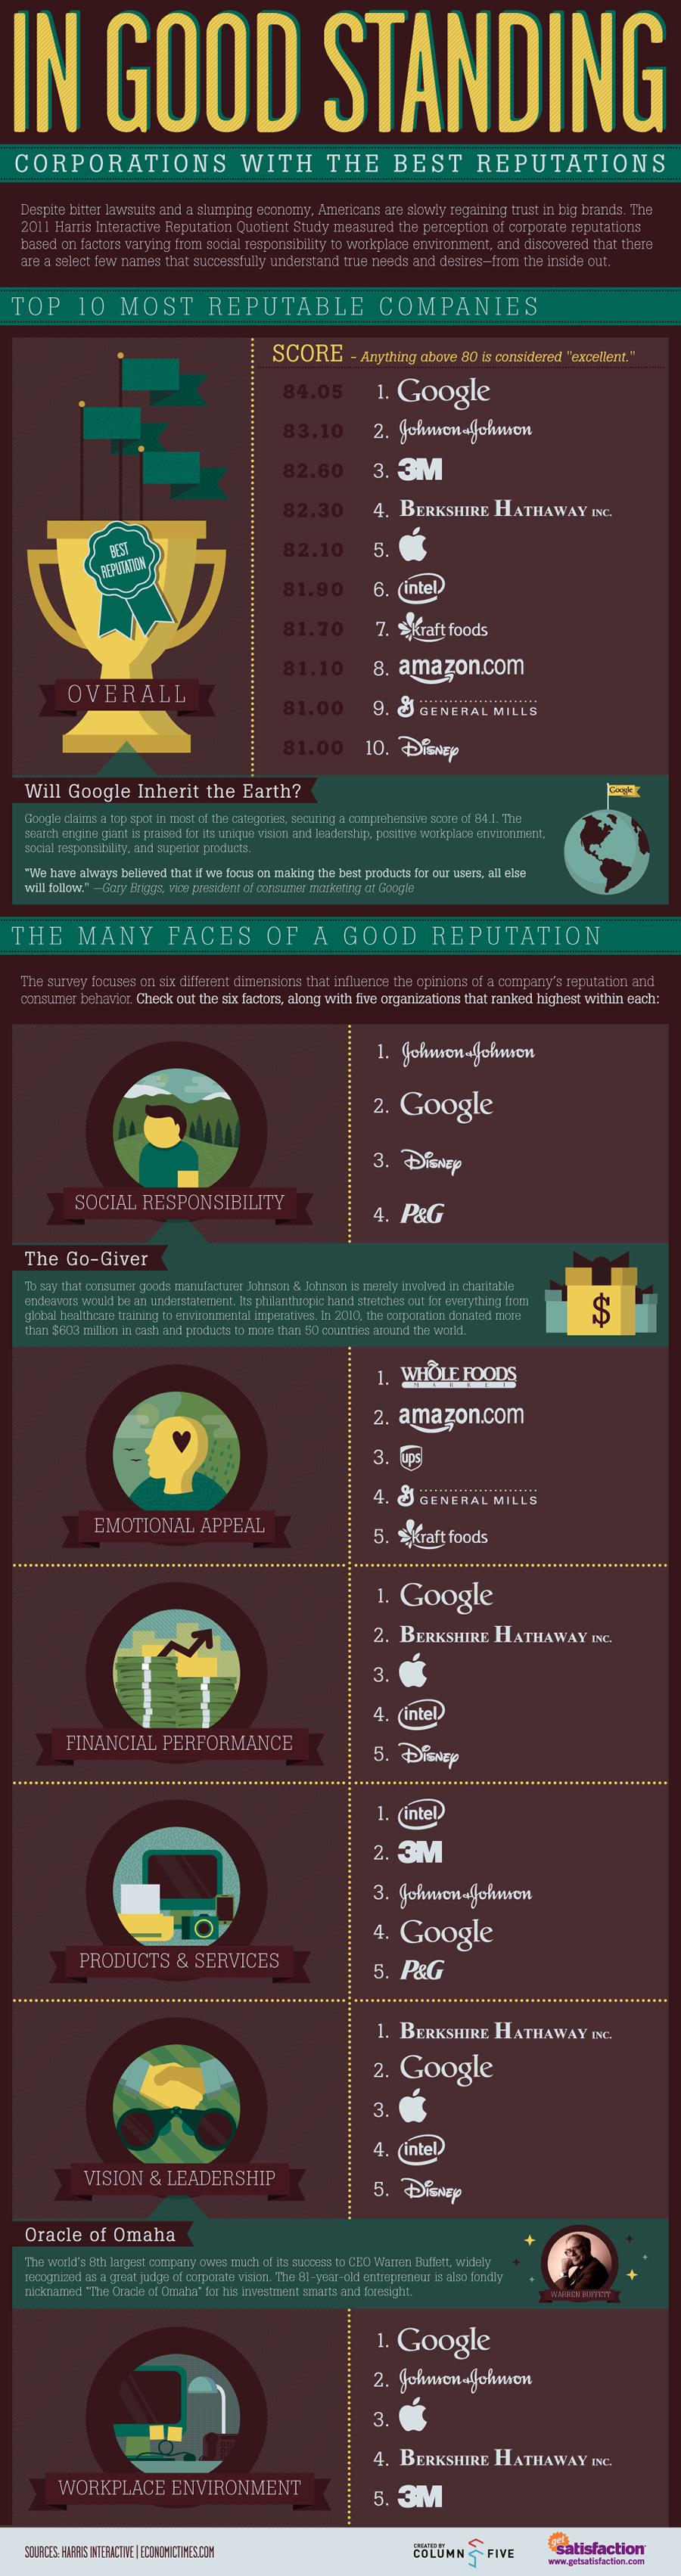 http://infographiclist.files.wordpress.com/2011/11/ingoodstanding_4ec41c1321534.jpg